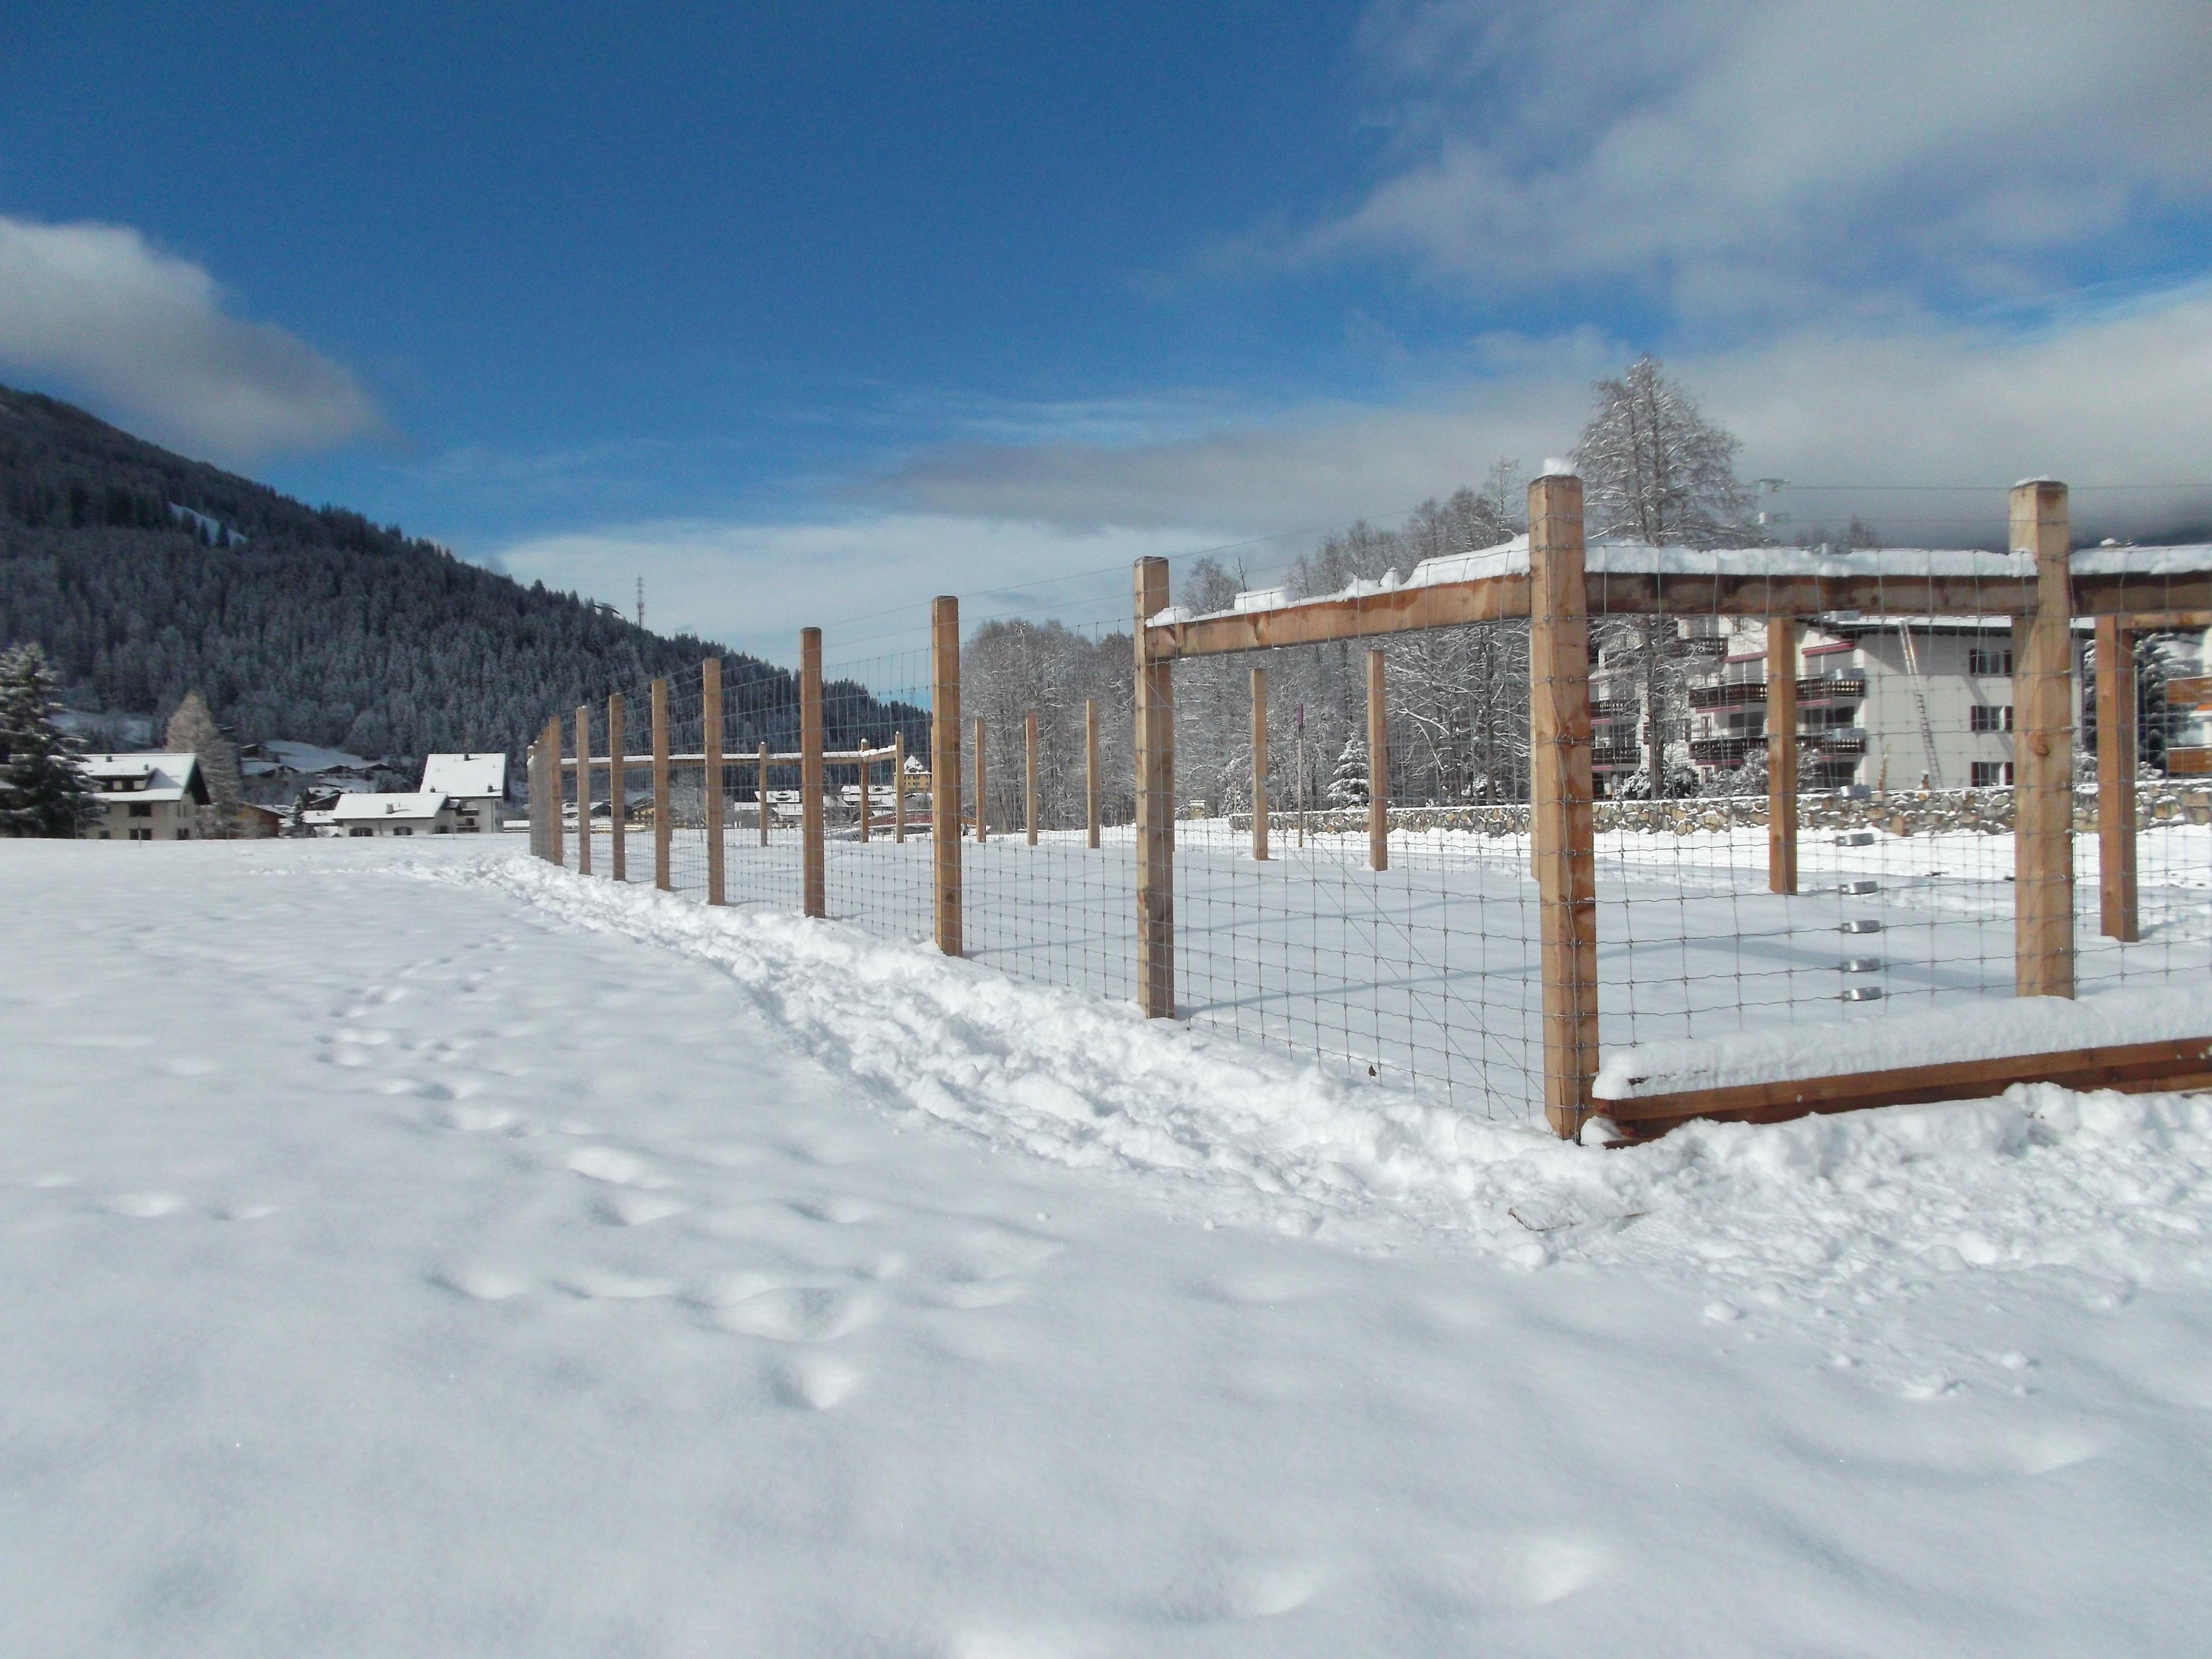 Wildschutzzaun in Davos